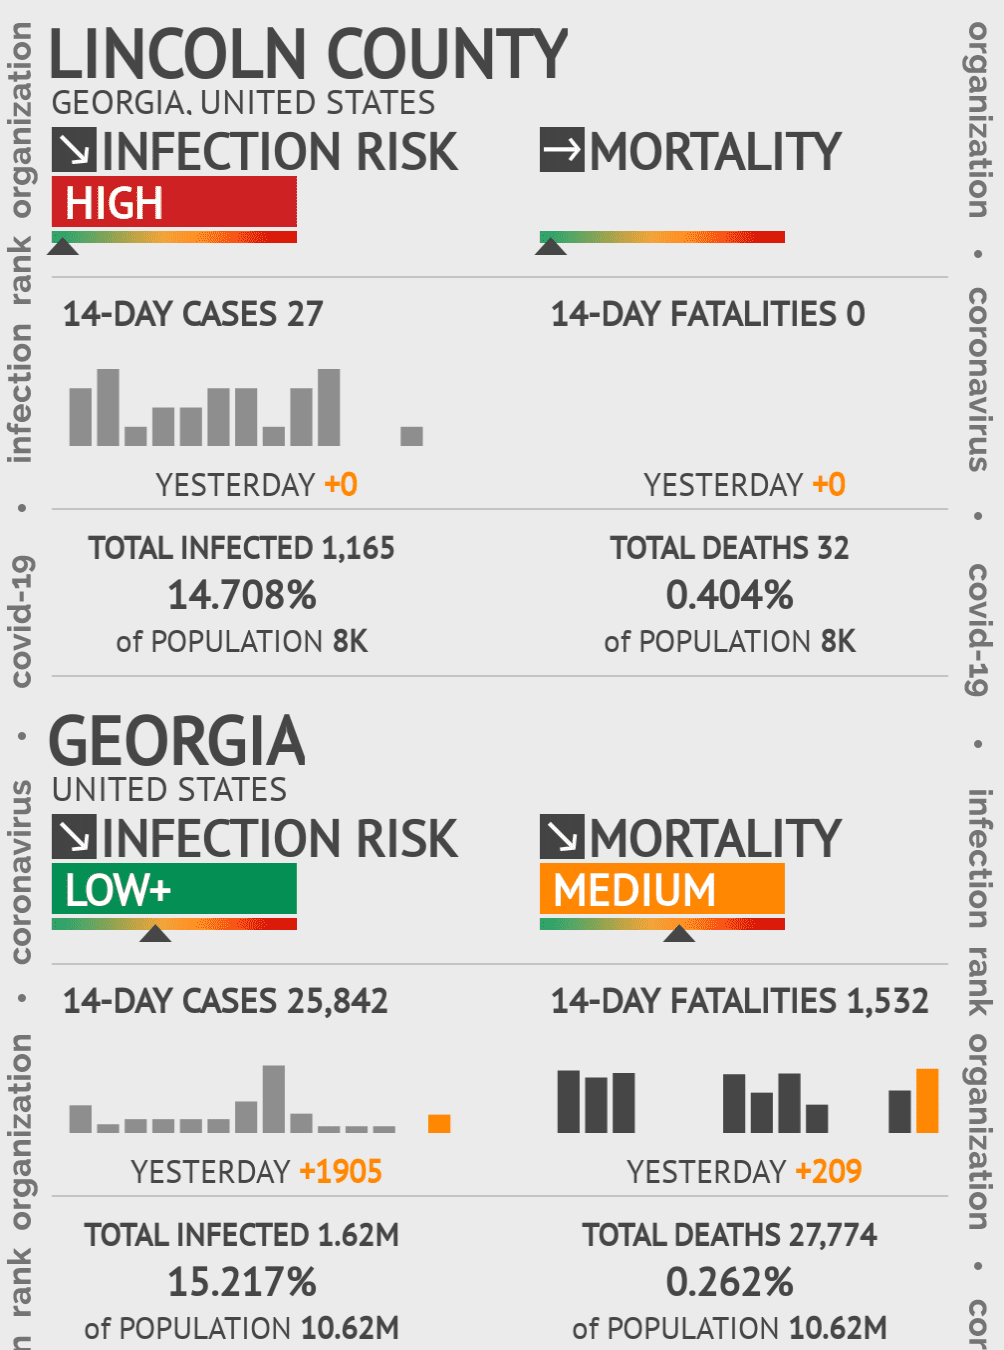 Lincoln County Coronavirus Covid-19 Risk of Infection on November 27, 2020